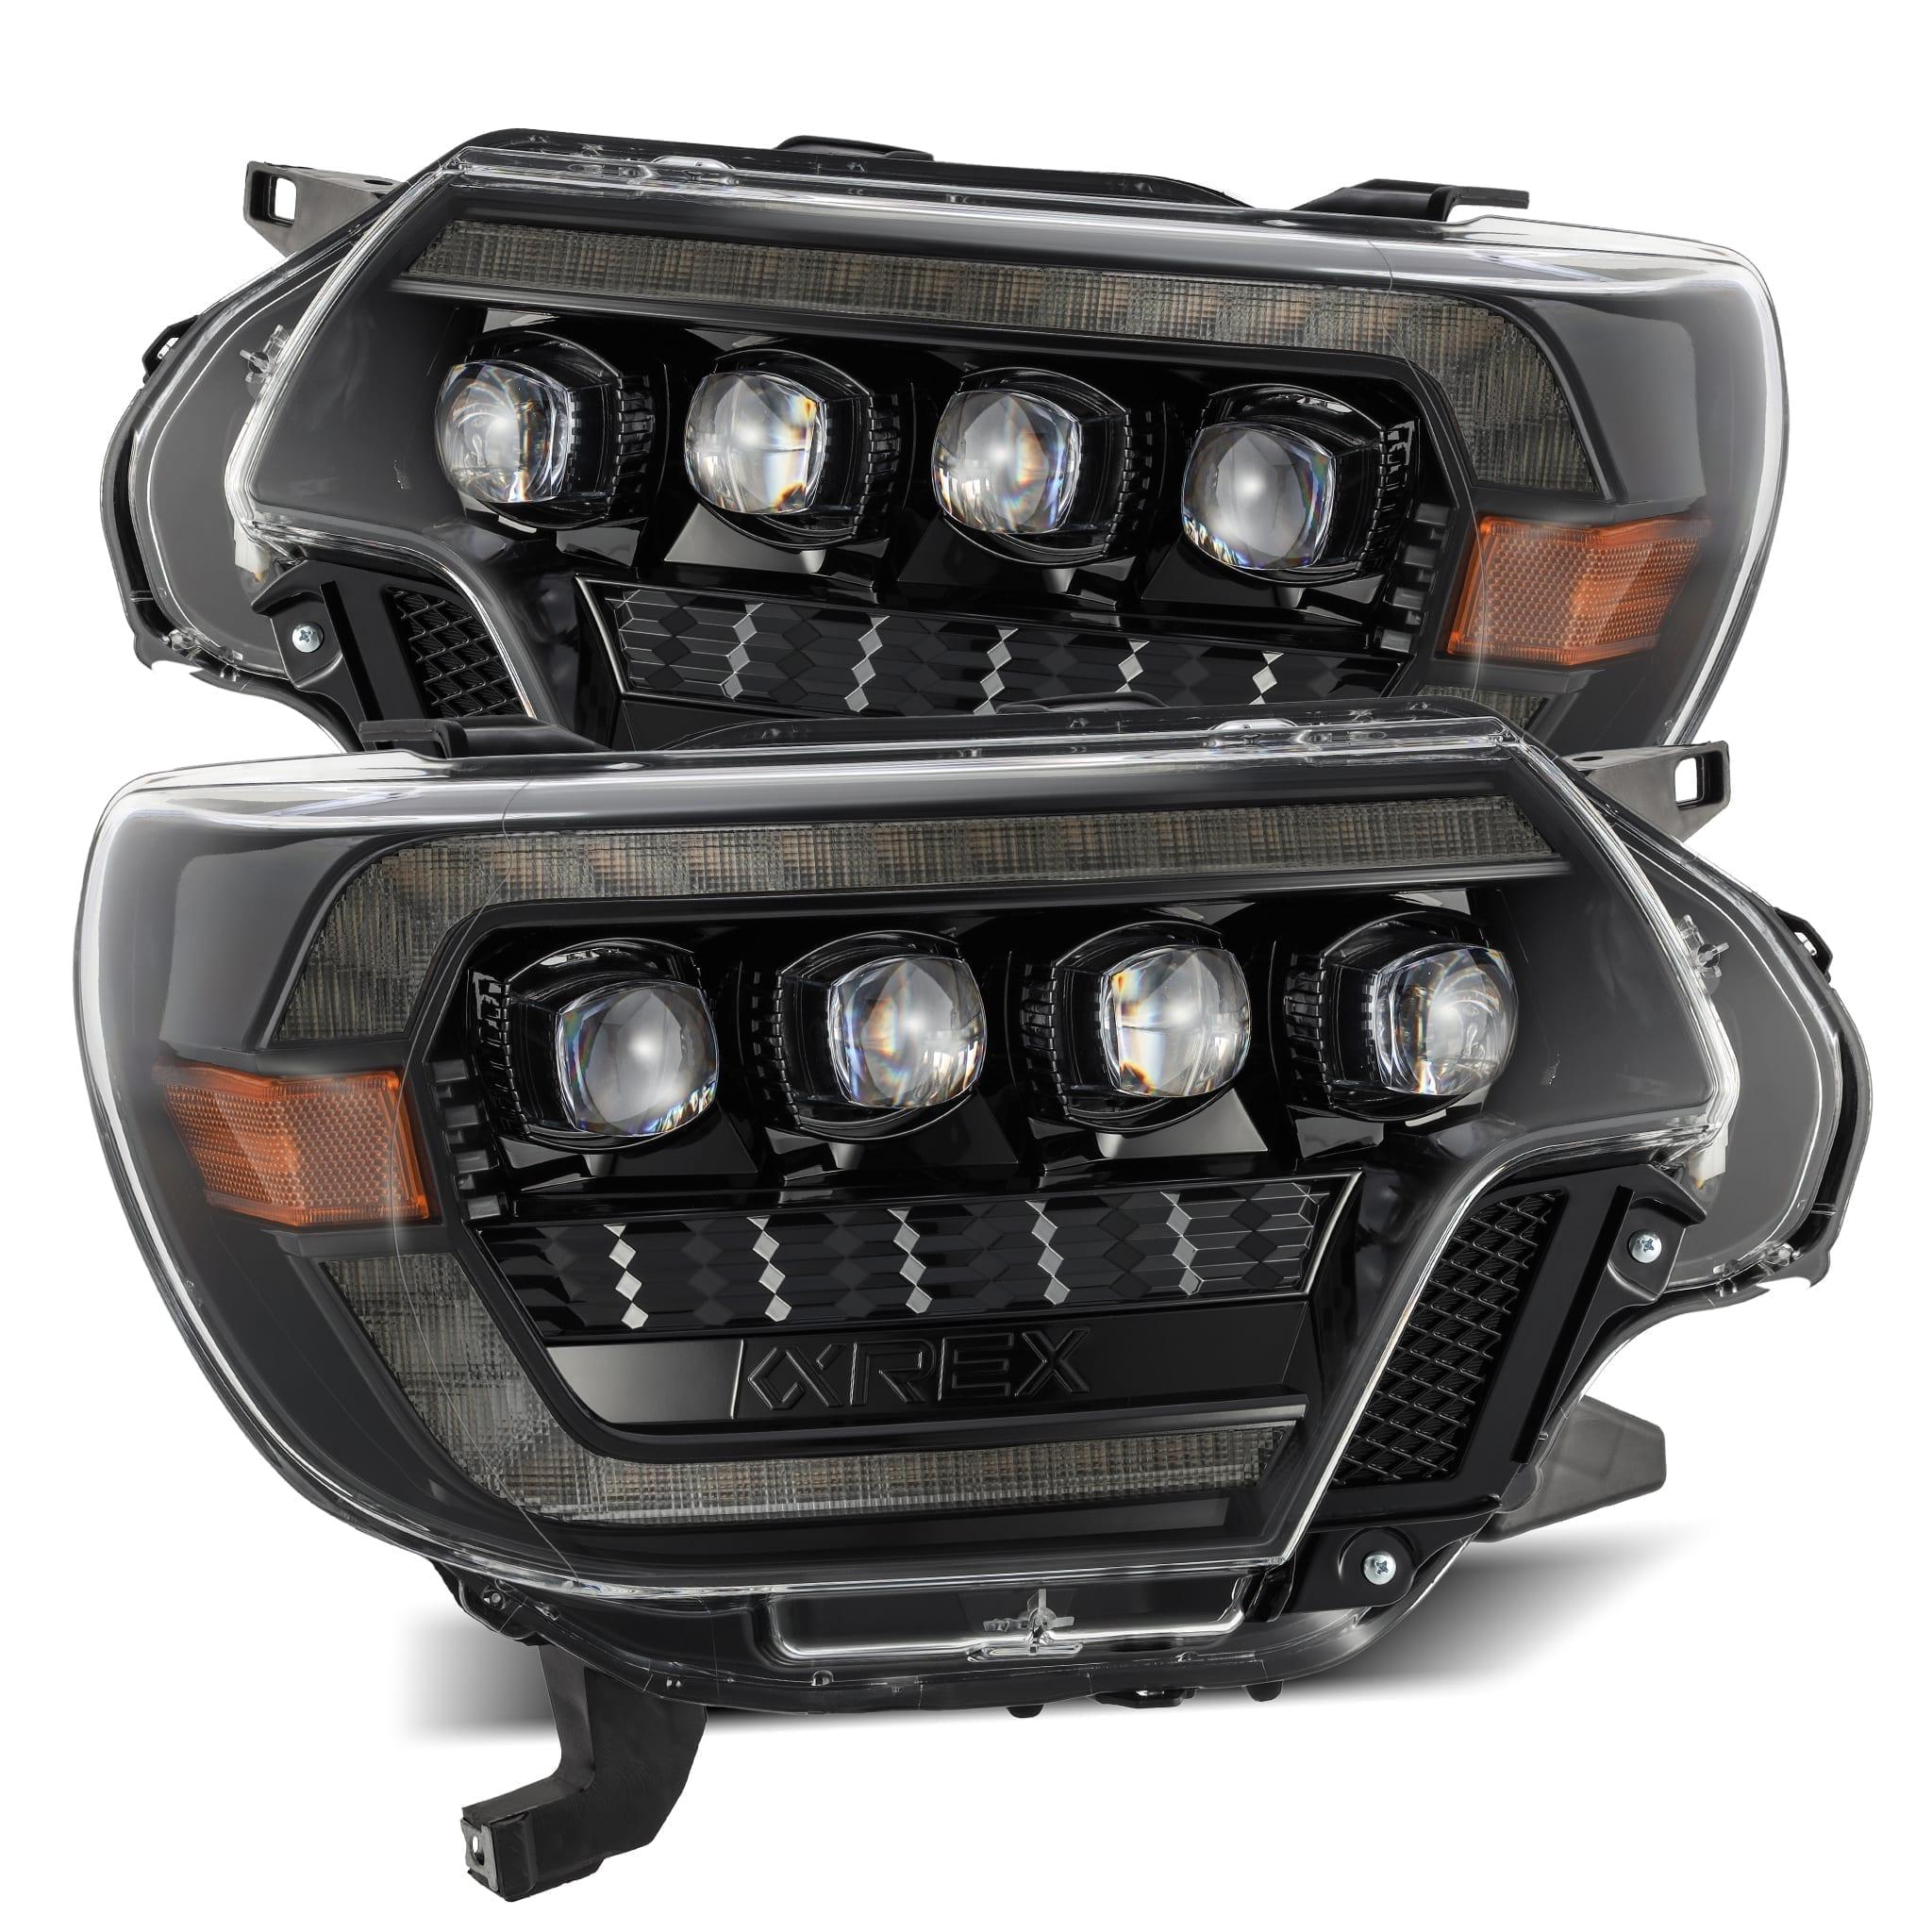 2012 2013 2014 2015 Toyota Tacoma AlphaRex NOVA-Series Projector Headlights Alpha-Black